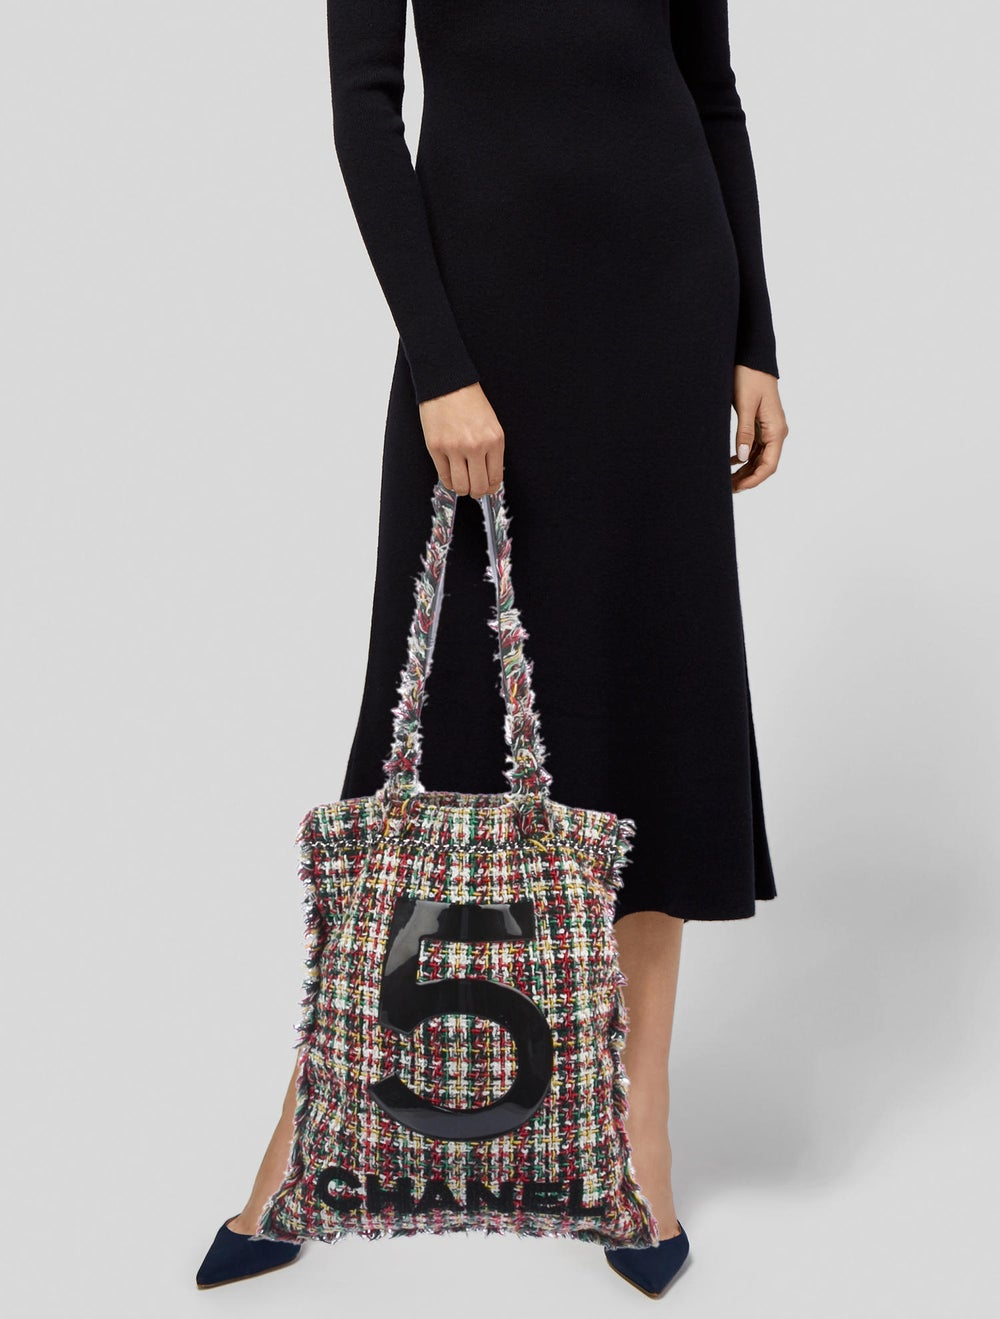 Chanel 2017 Large Tweed Shopping Bag Green - image 2